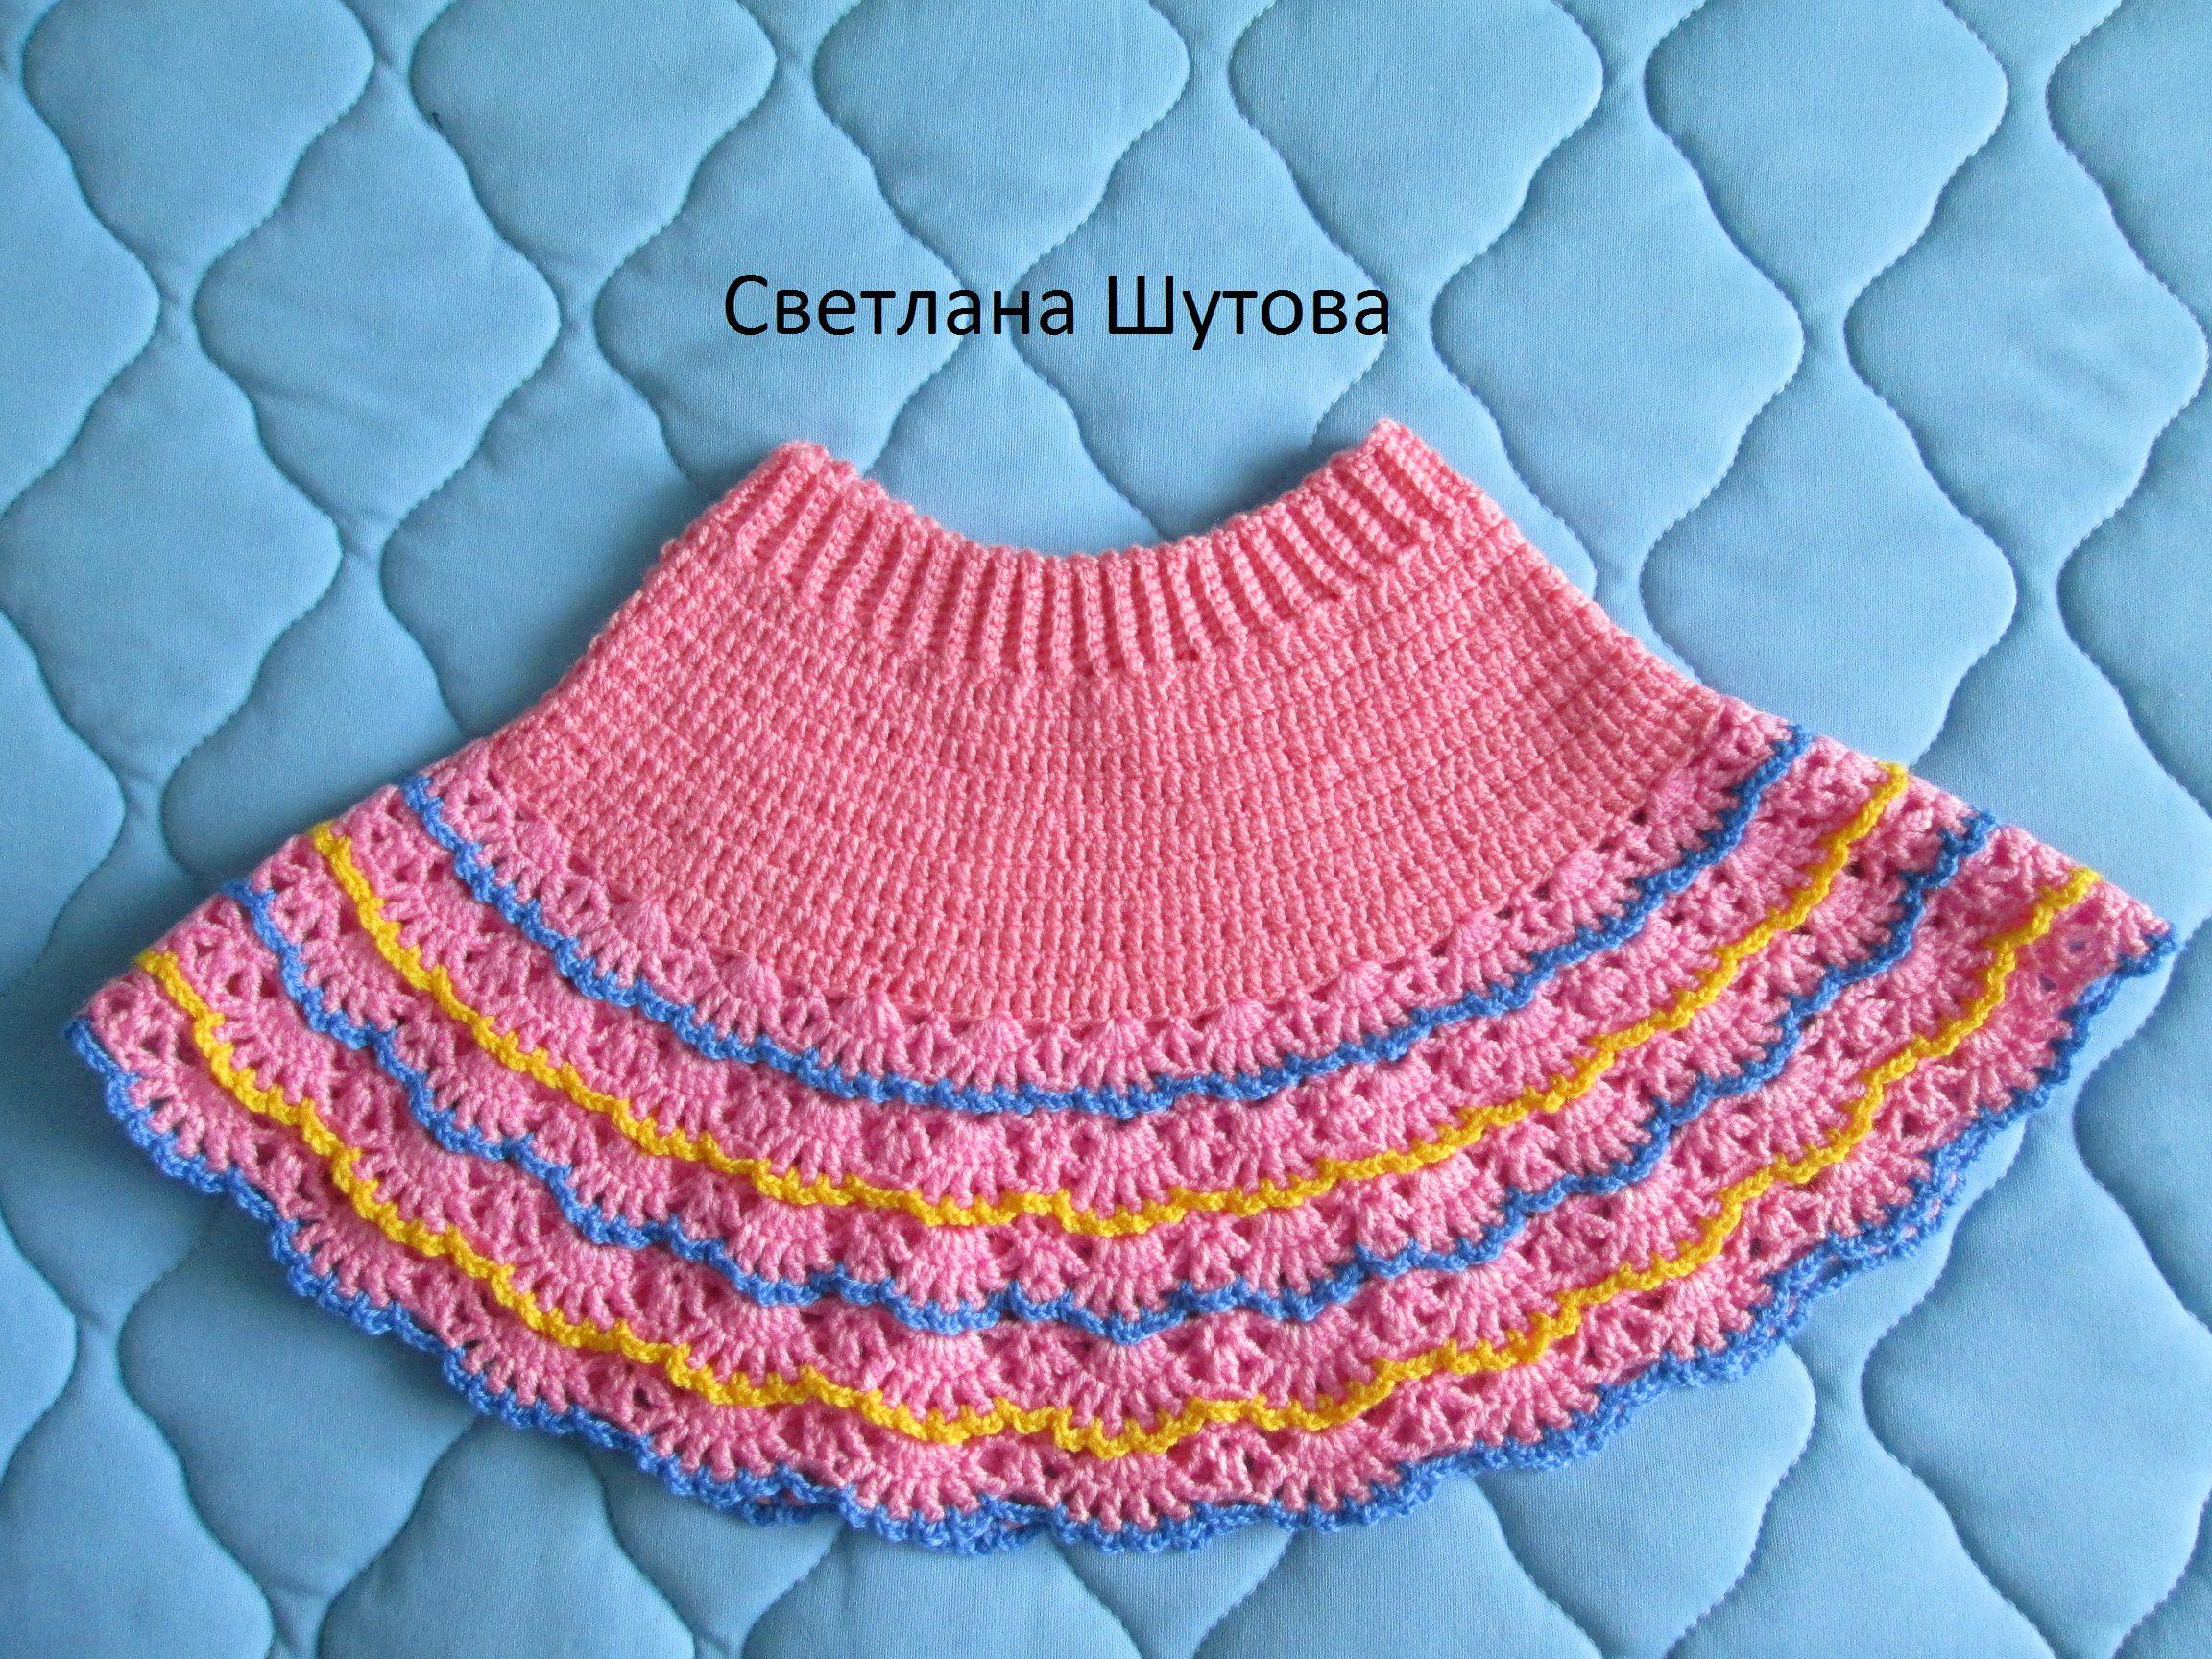 крючком юбочка одежда вязание ручнаяработа девочкам